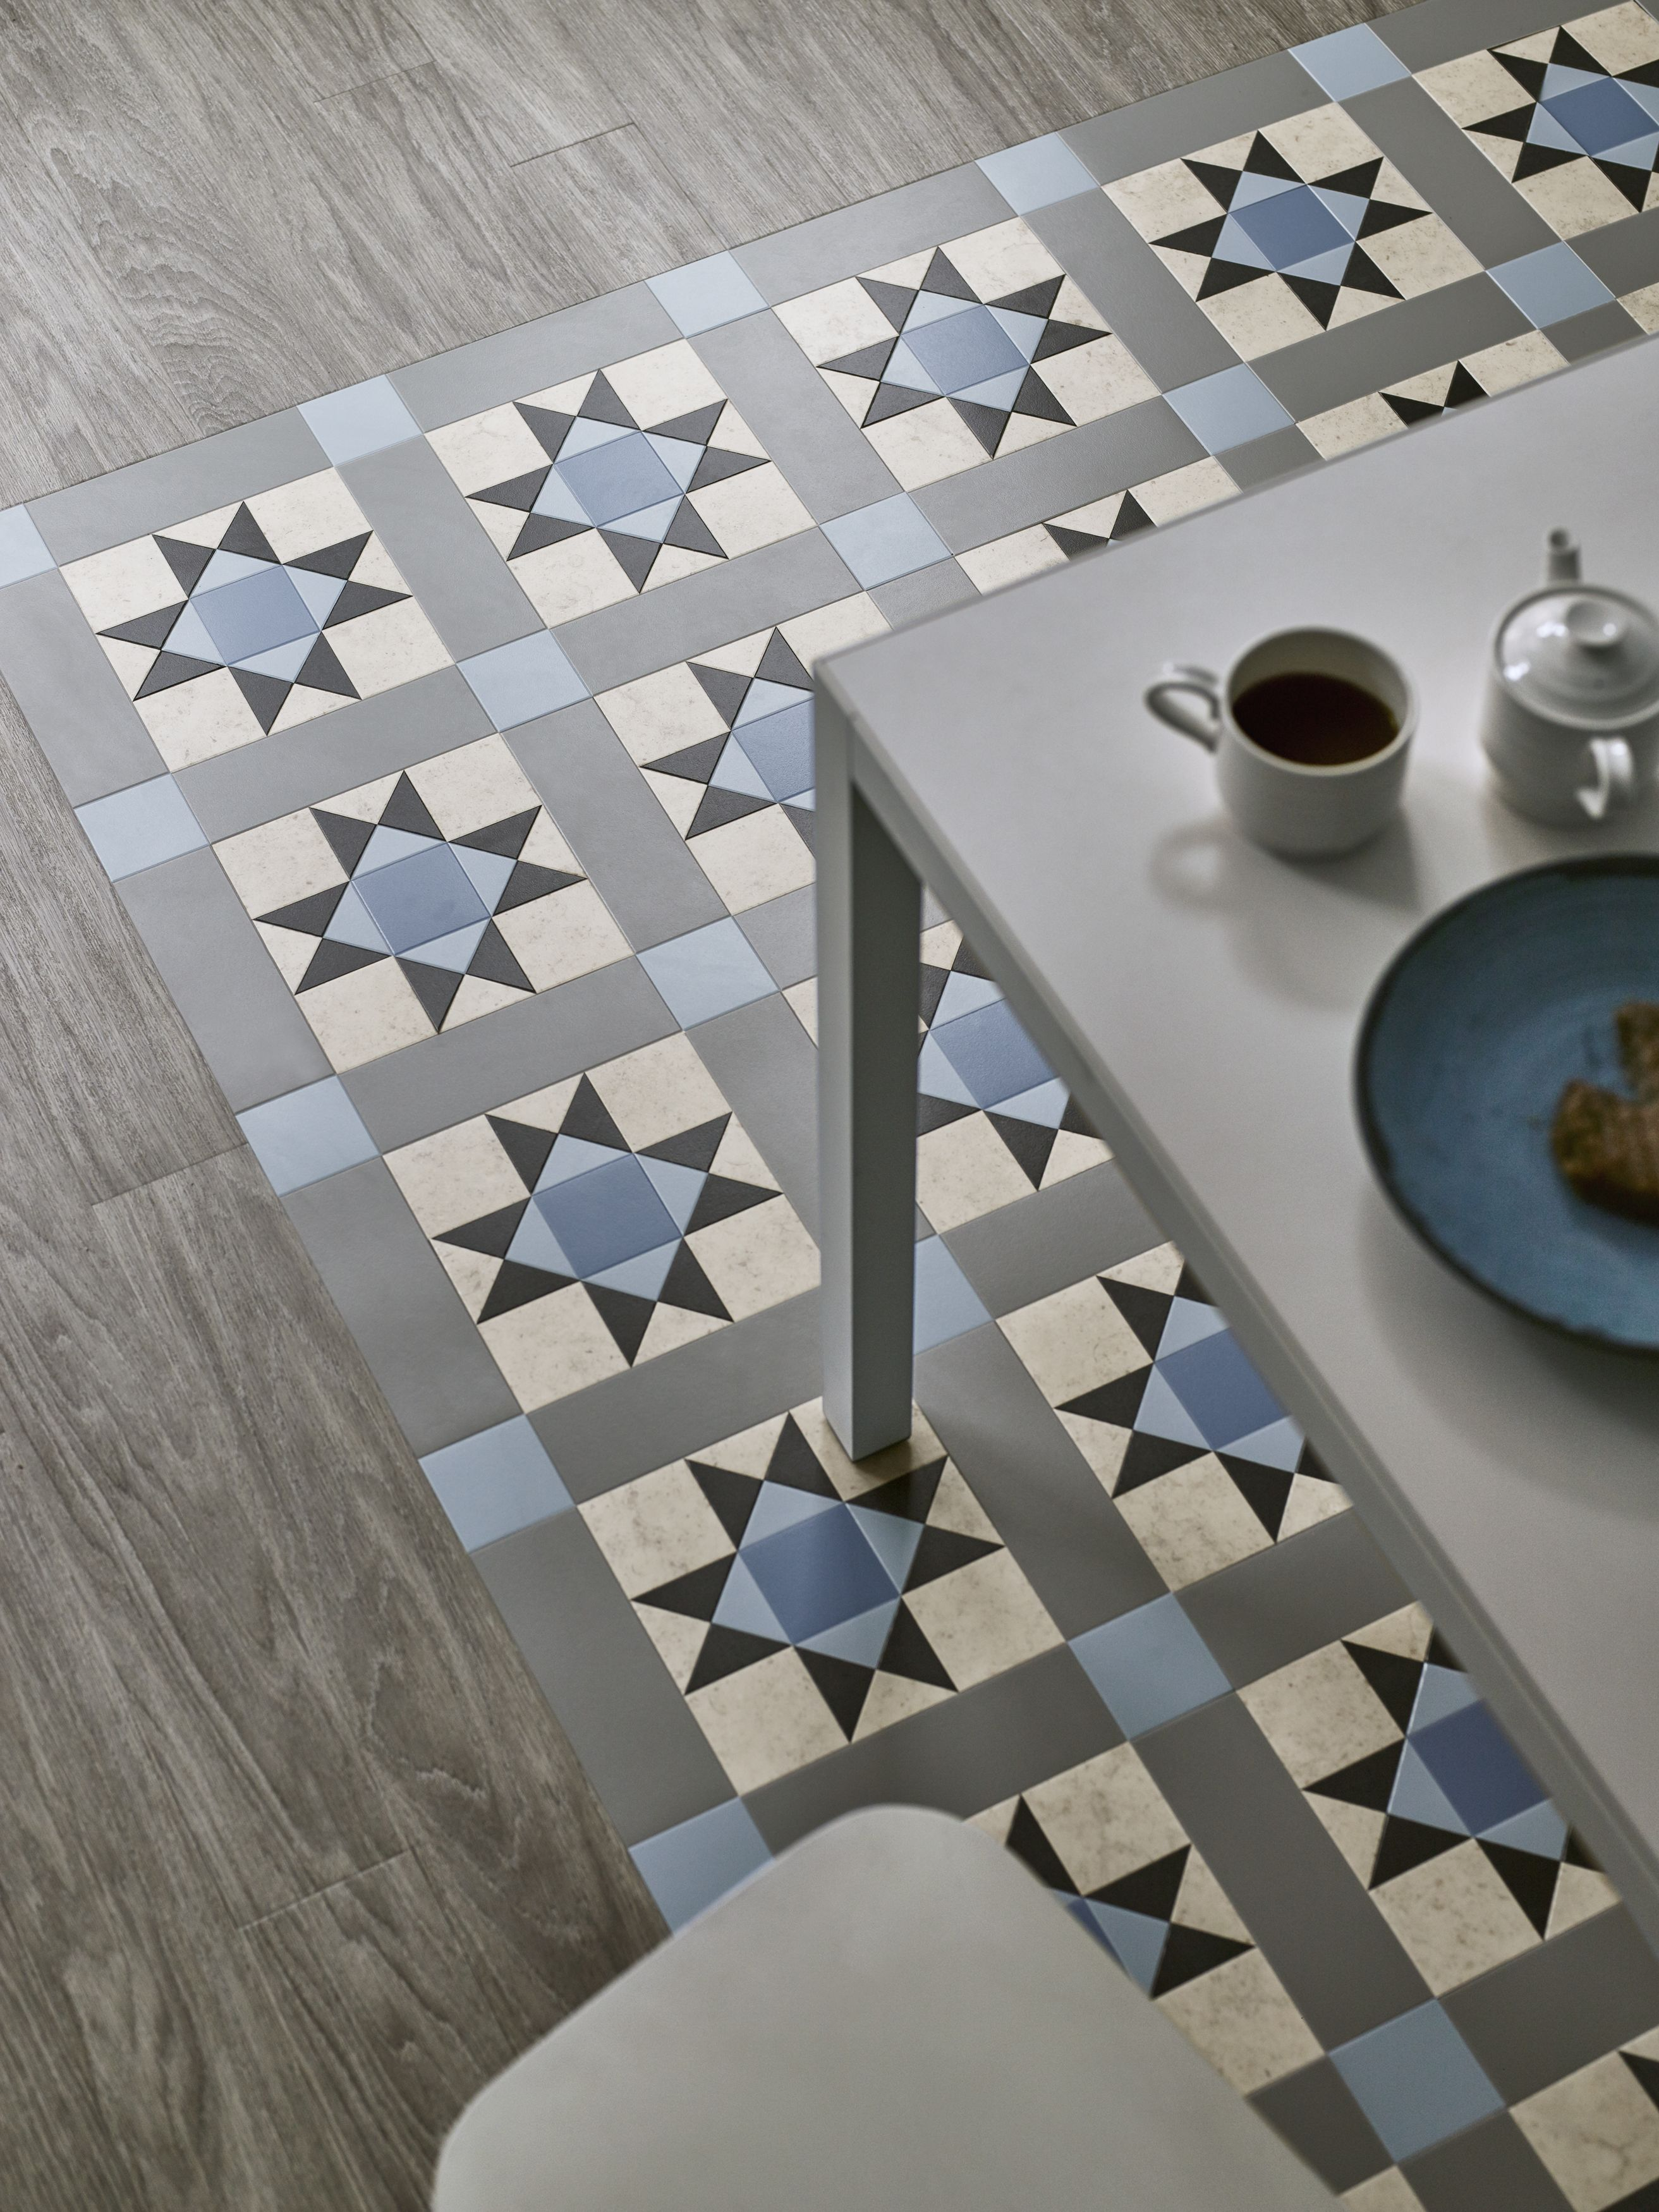 Corona Azure from Amtico Decor #interiors #interiordesign #amtico